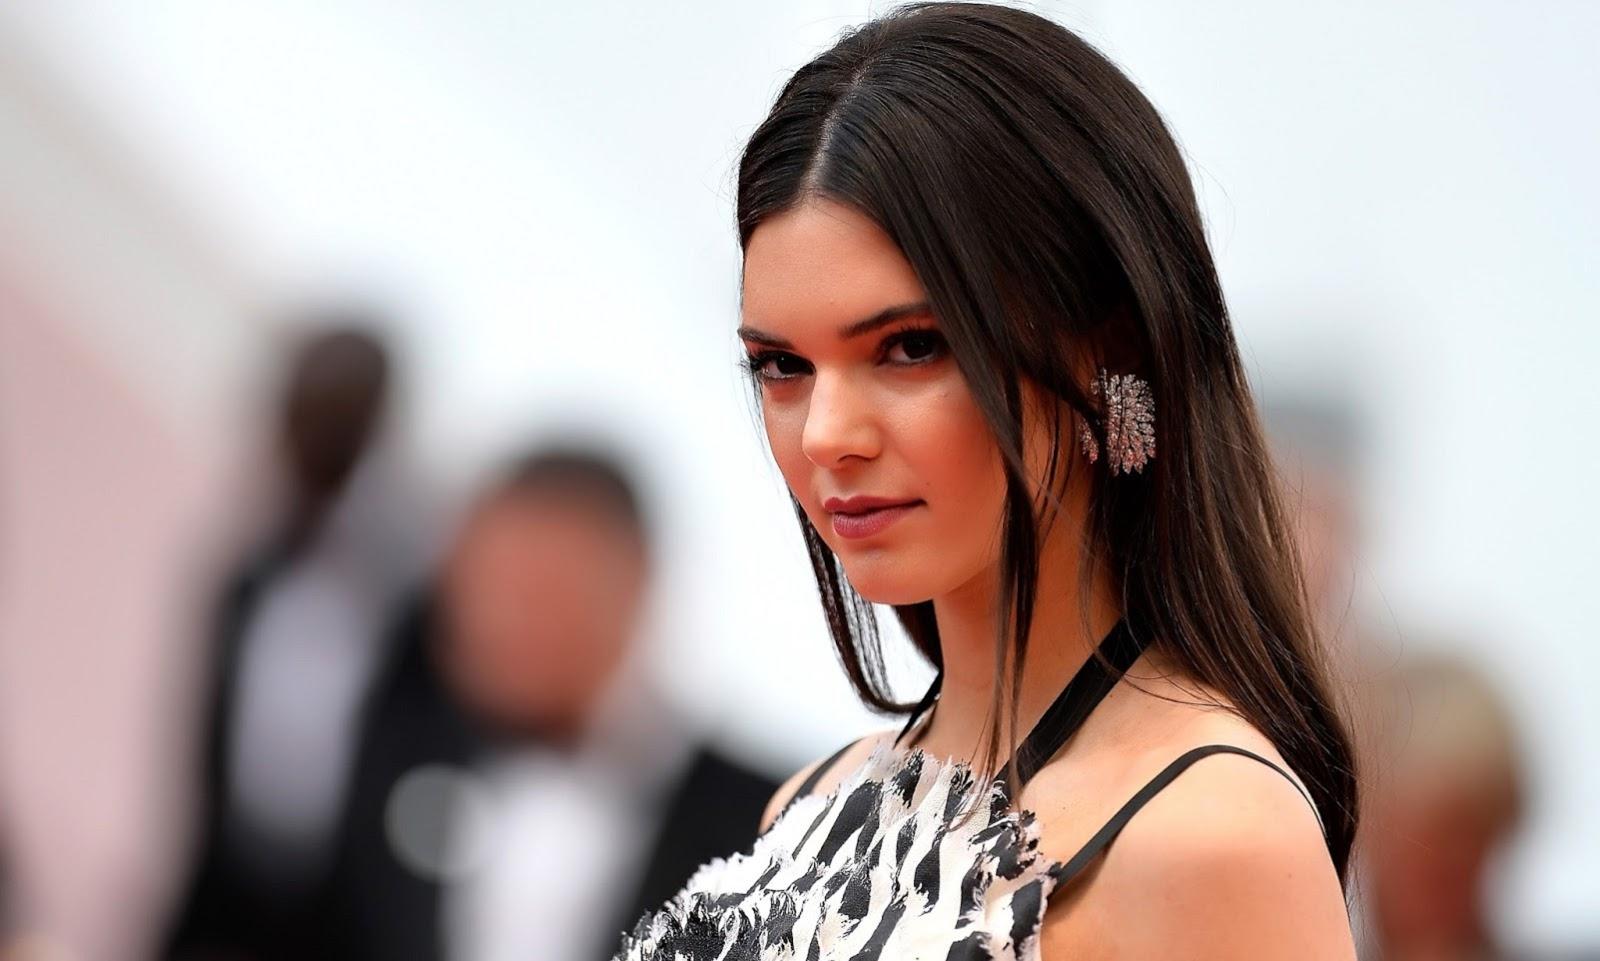 Kendall Jenner Biography - Photo Media Magazine - Photo